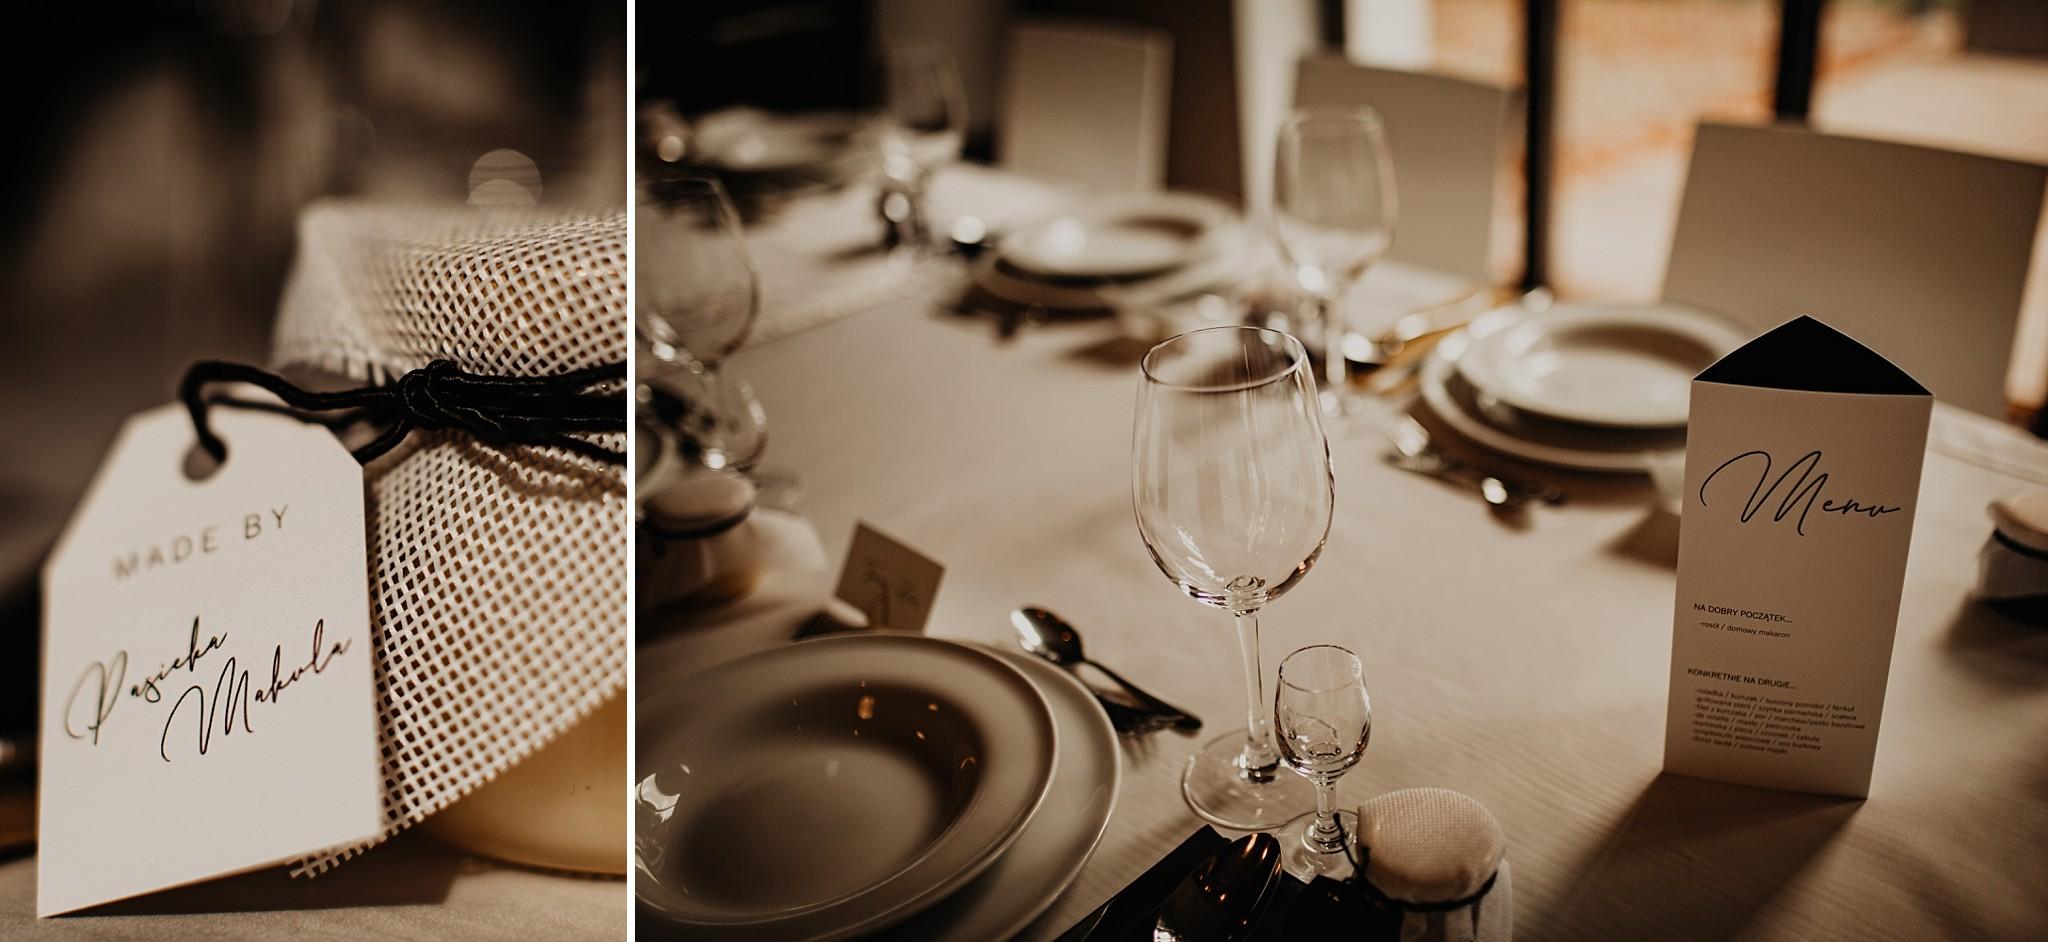 fotograf poznan wesele dobra truskawka piekne wesele pod poznaniem wesele w dobrej truskawce piekna para mloda slub marzen slub koronawirus slub listopad wesele koronawirus 007